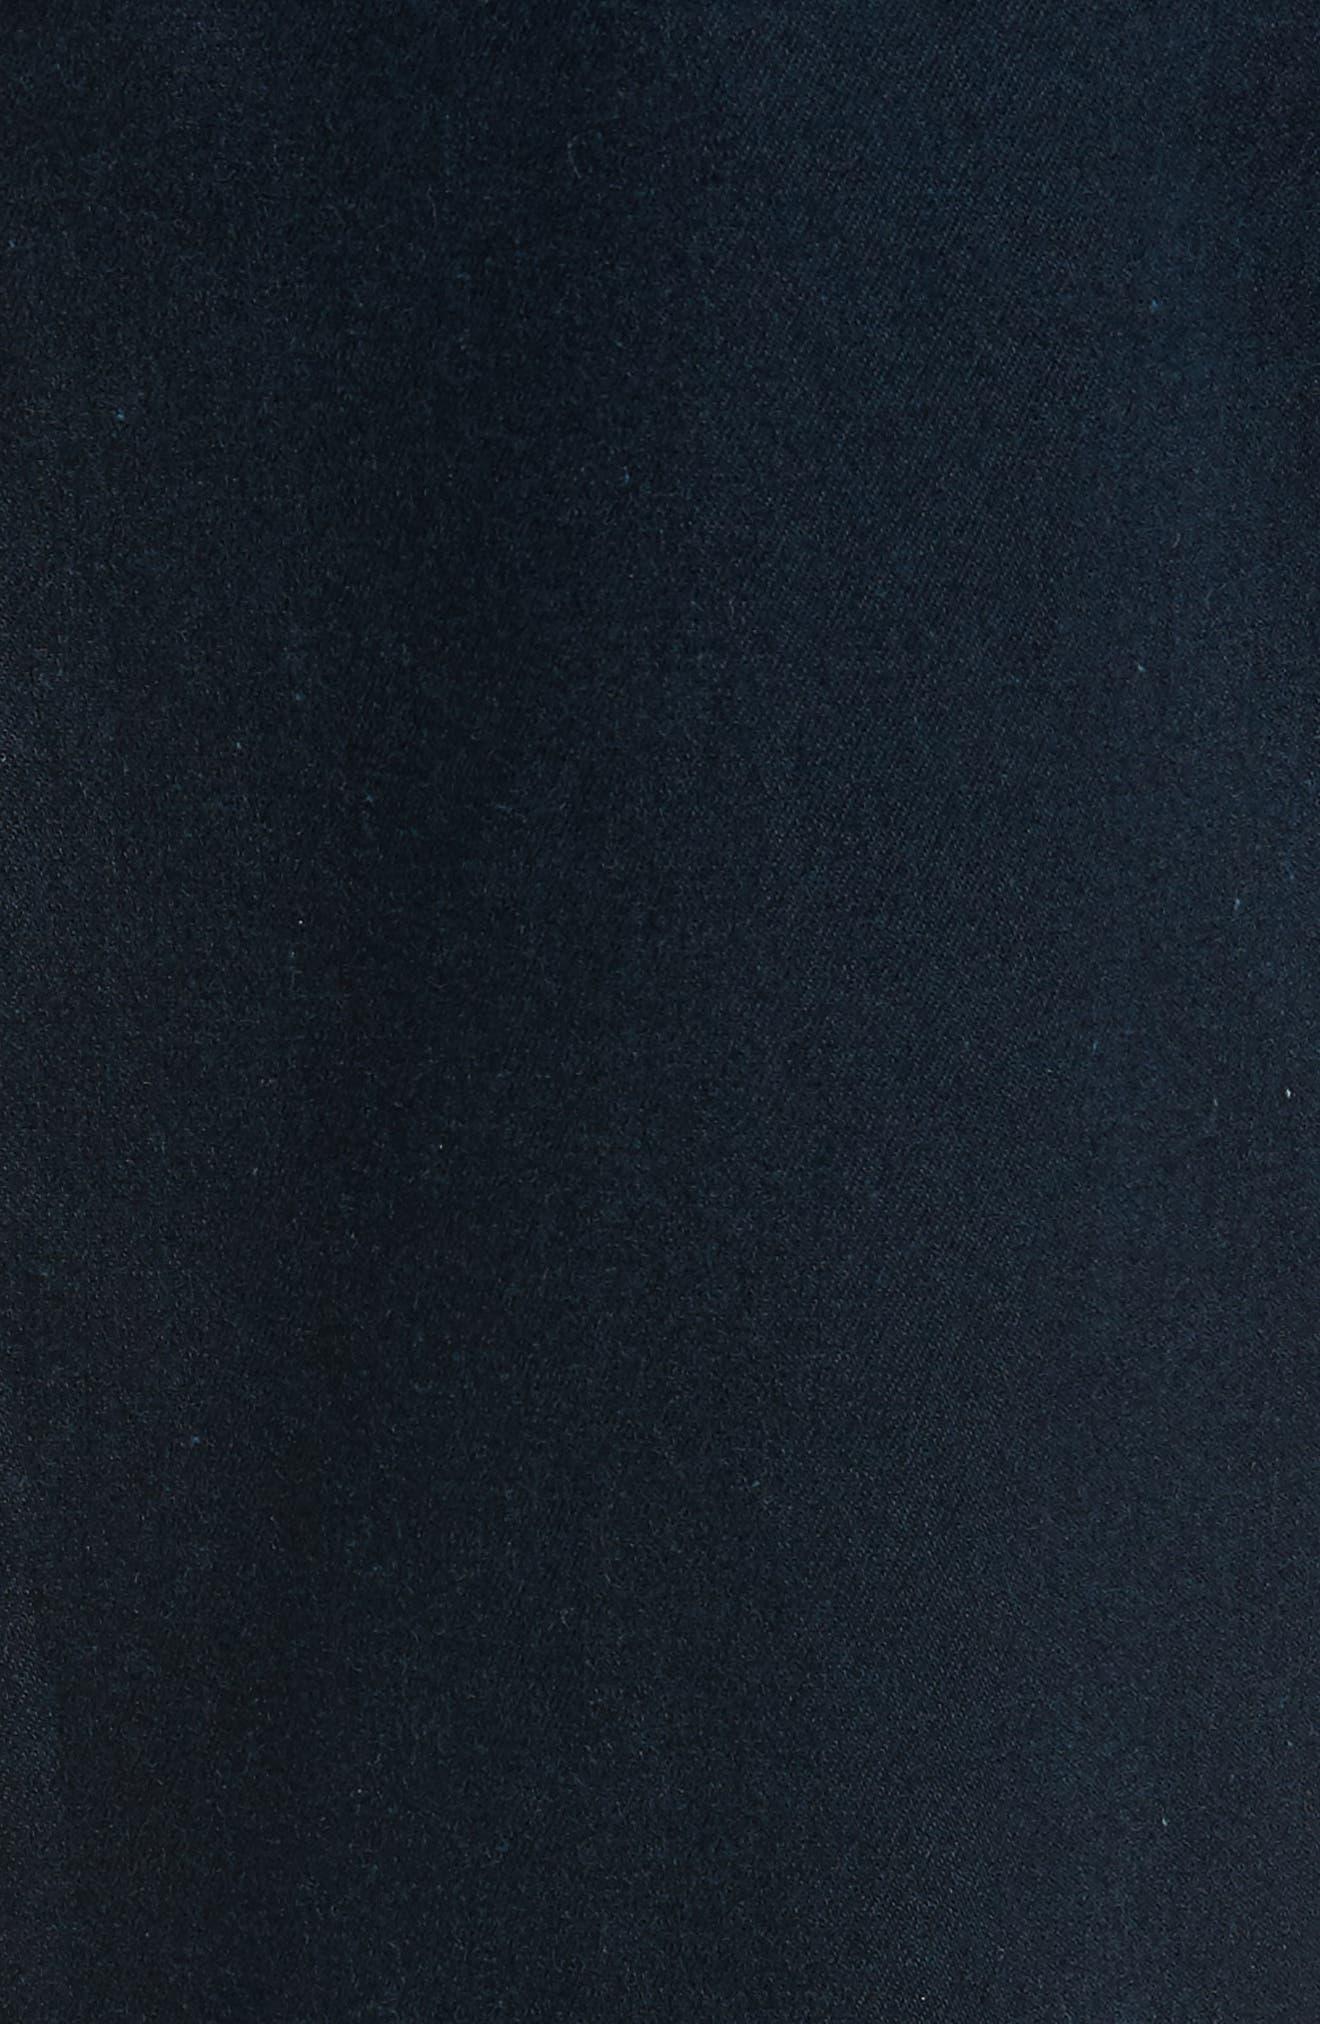 Slimmy Slim Fit Jeans,                             Alternate thumbnail 5, color,